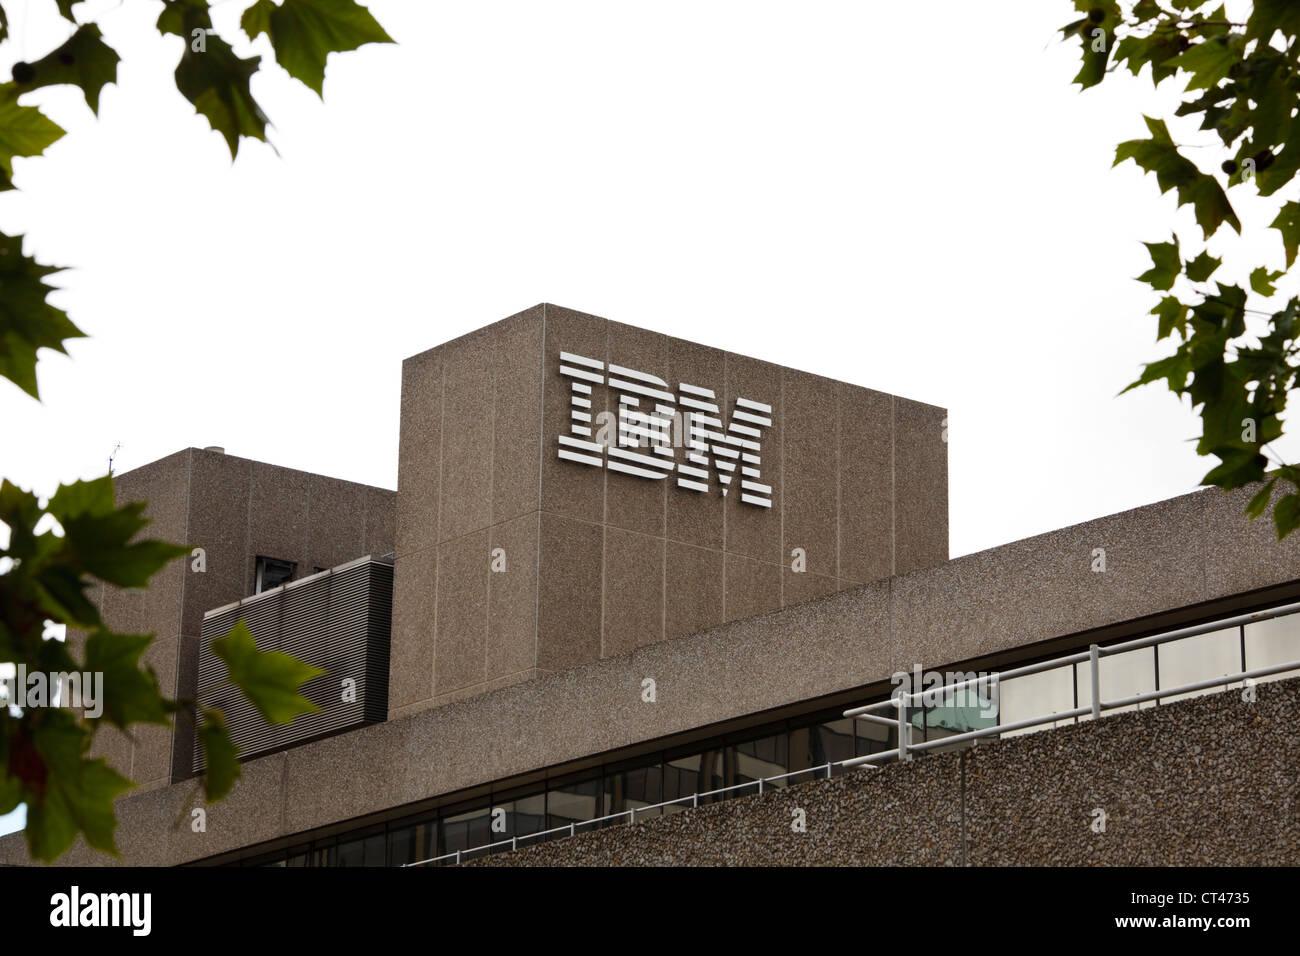 ibm-building-southbank-london-CT4735.jpg